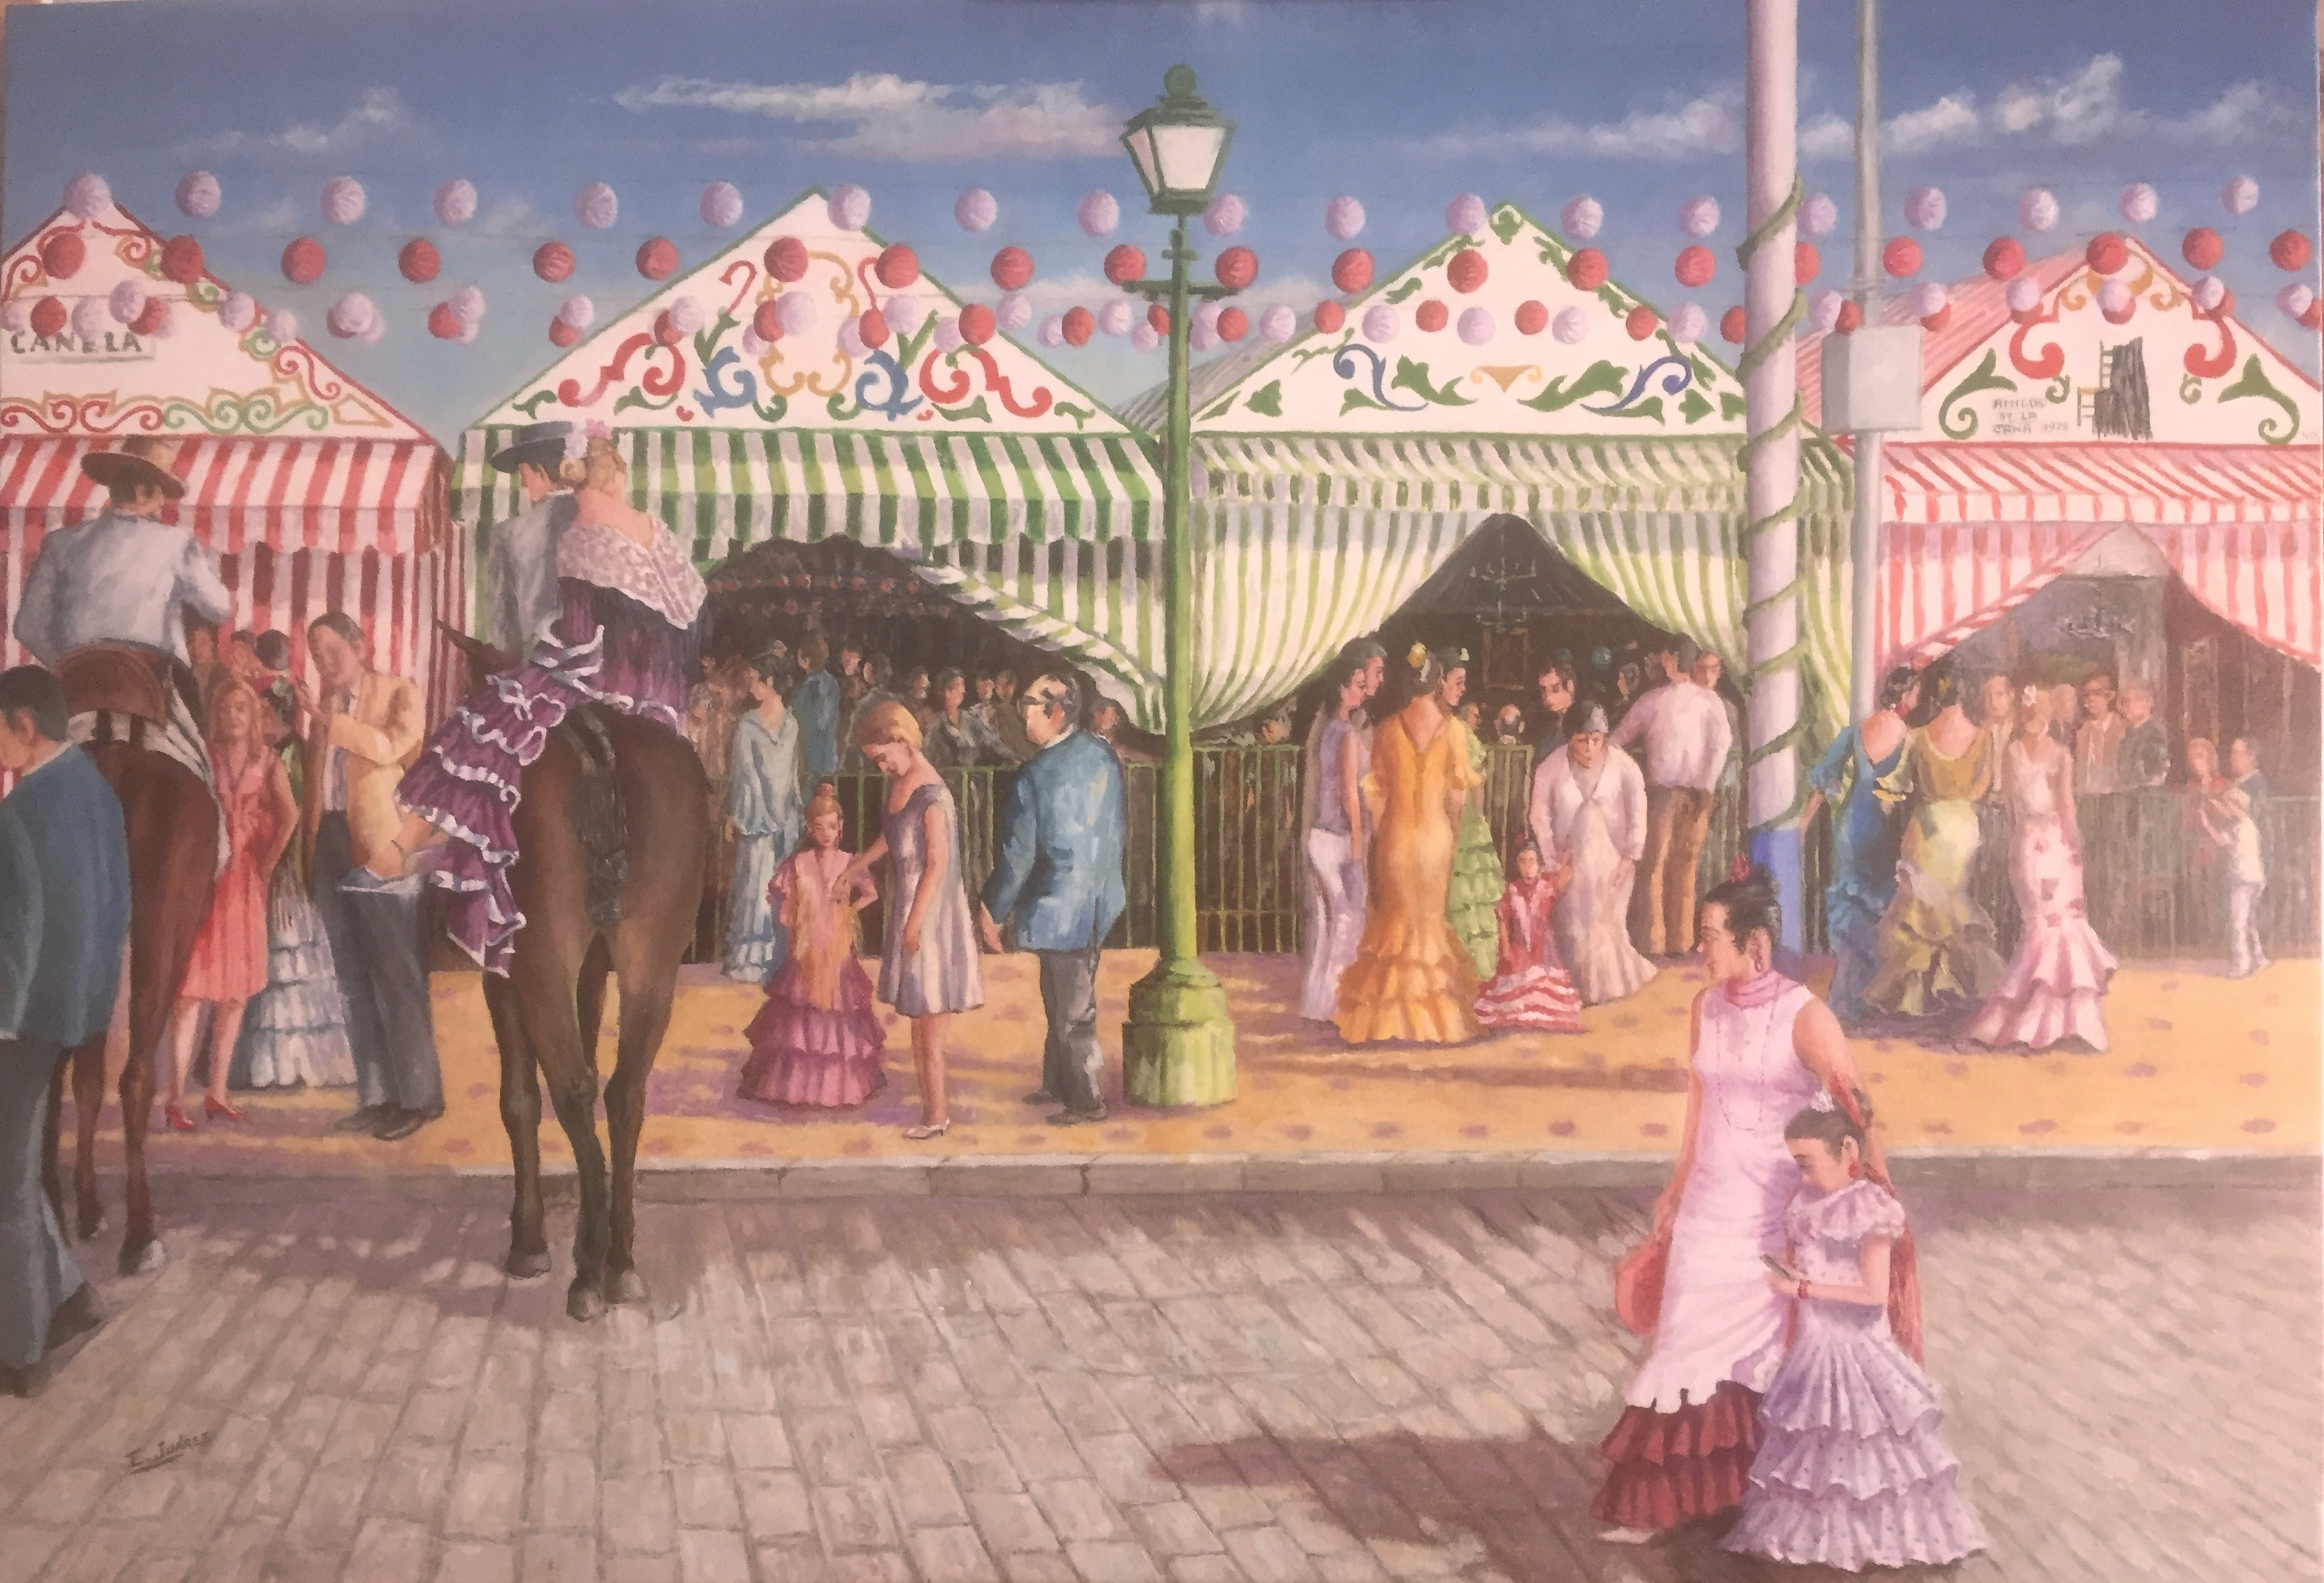 Sevilla's fair